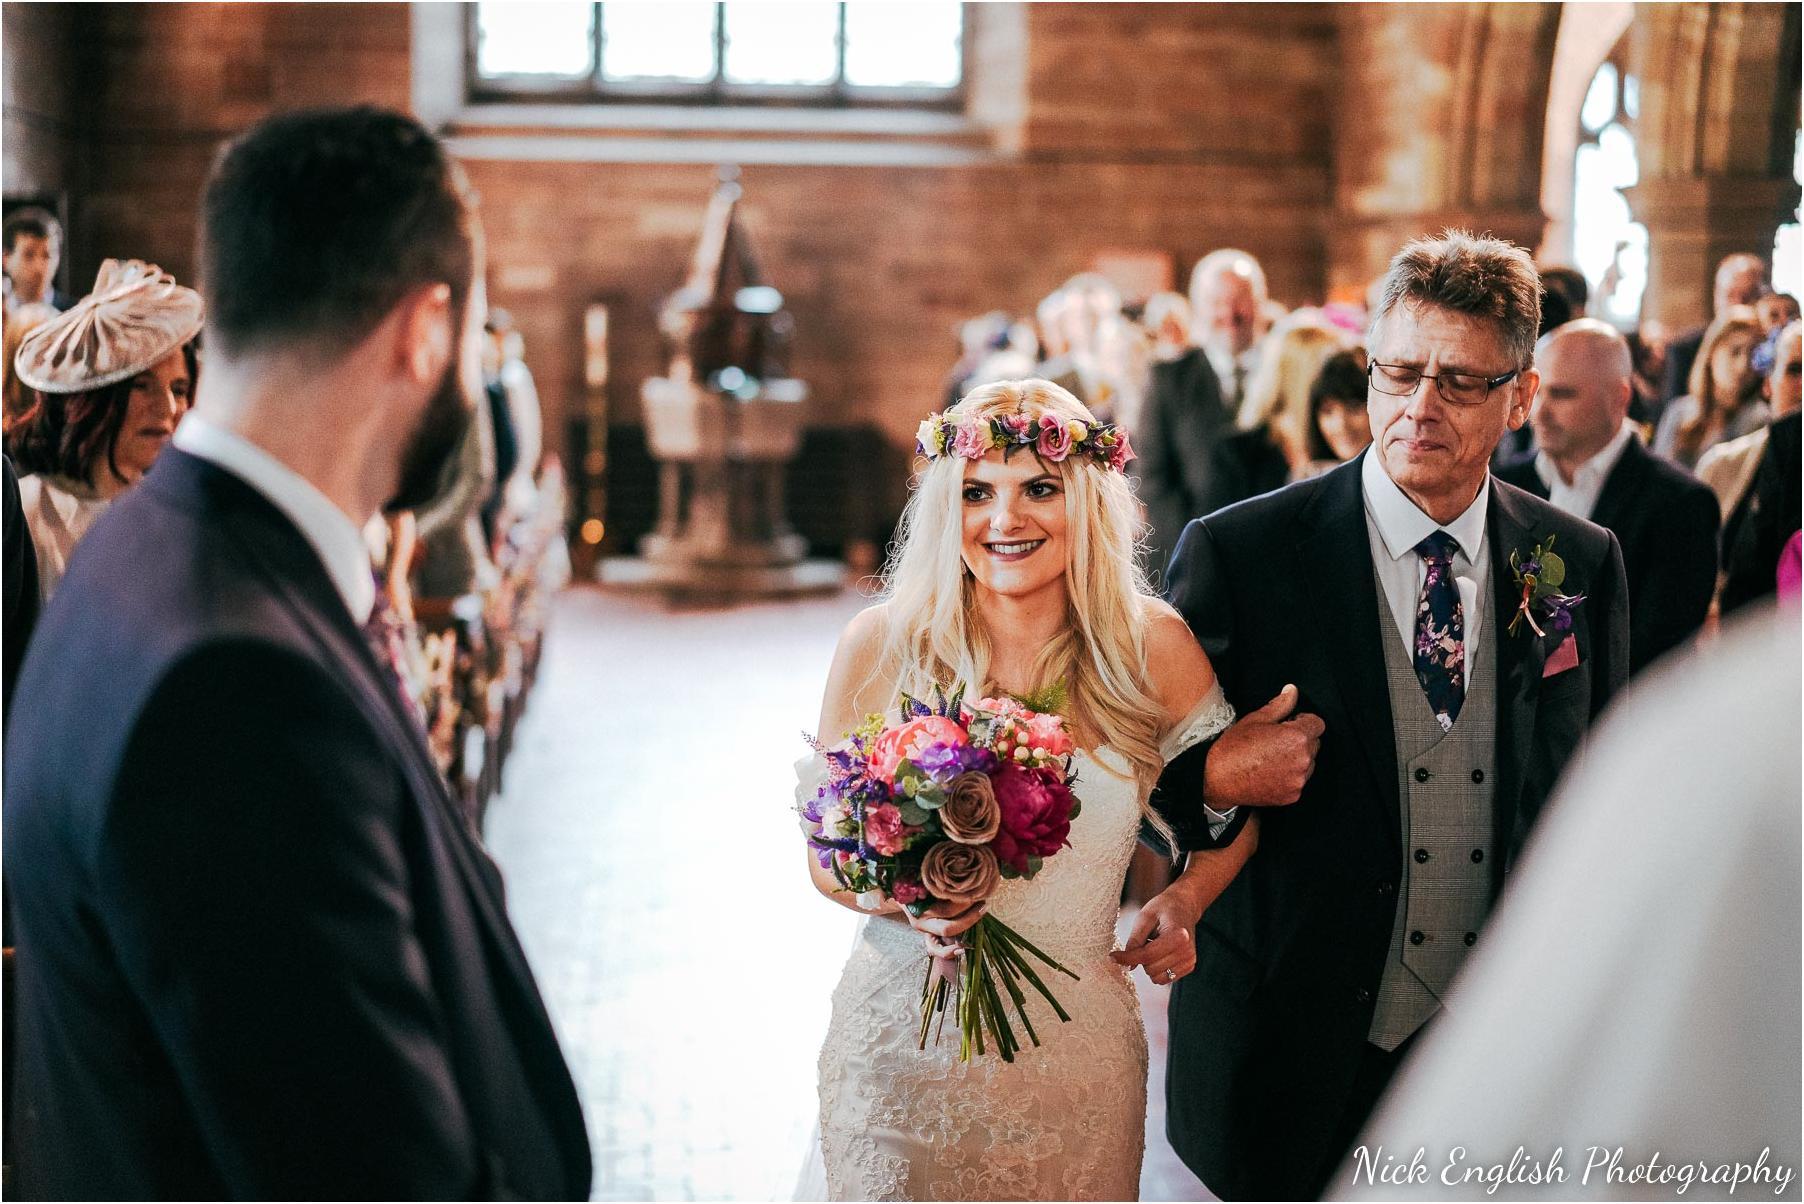 Whitebottom_Farm_Wedding_Manchester_Photograph-26.jpg